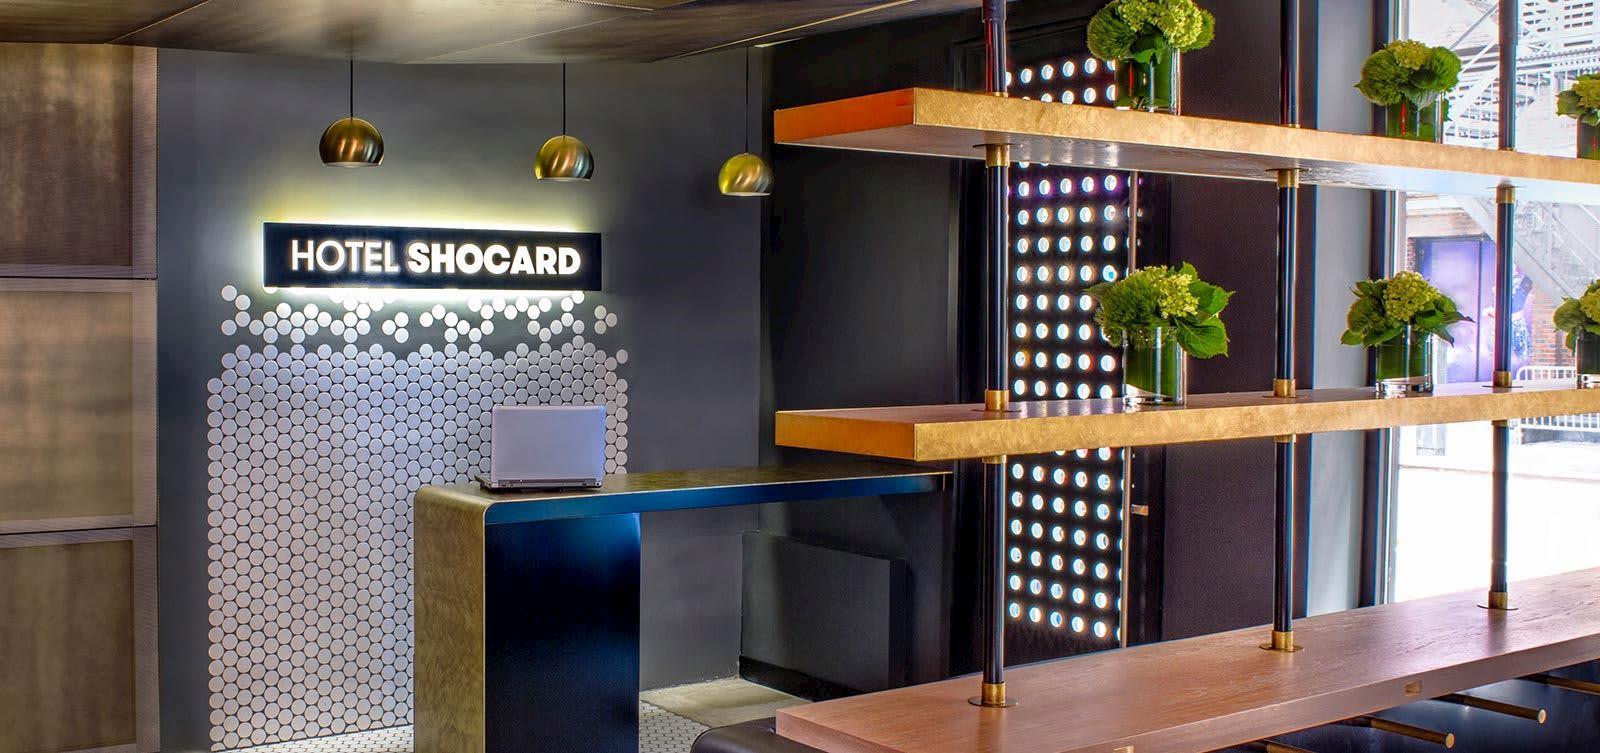 Hotel Shocard, New York Services